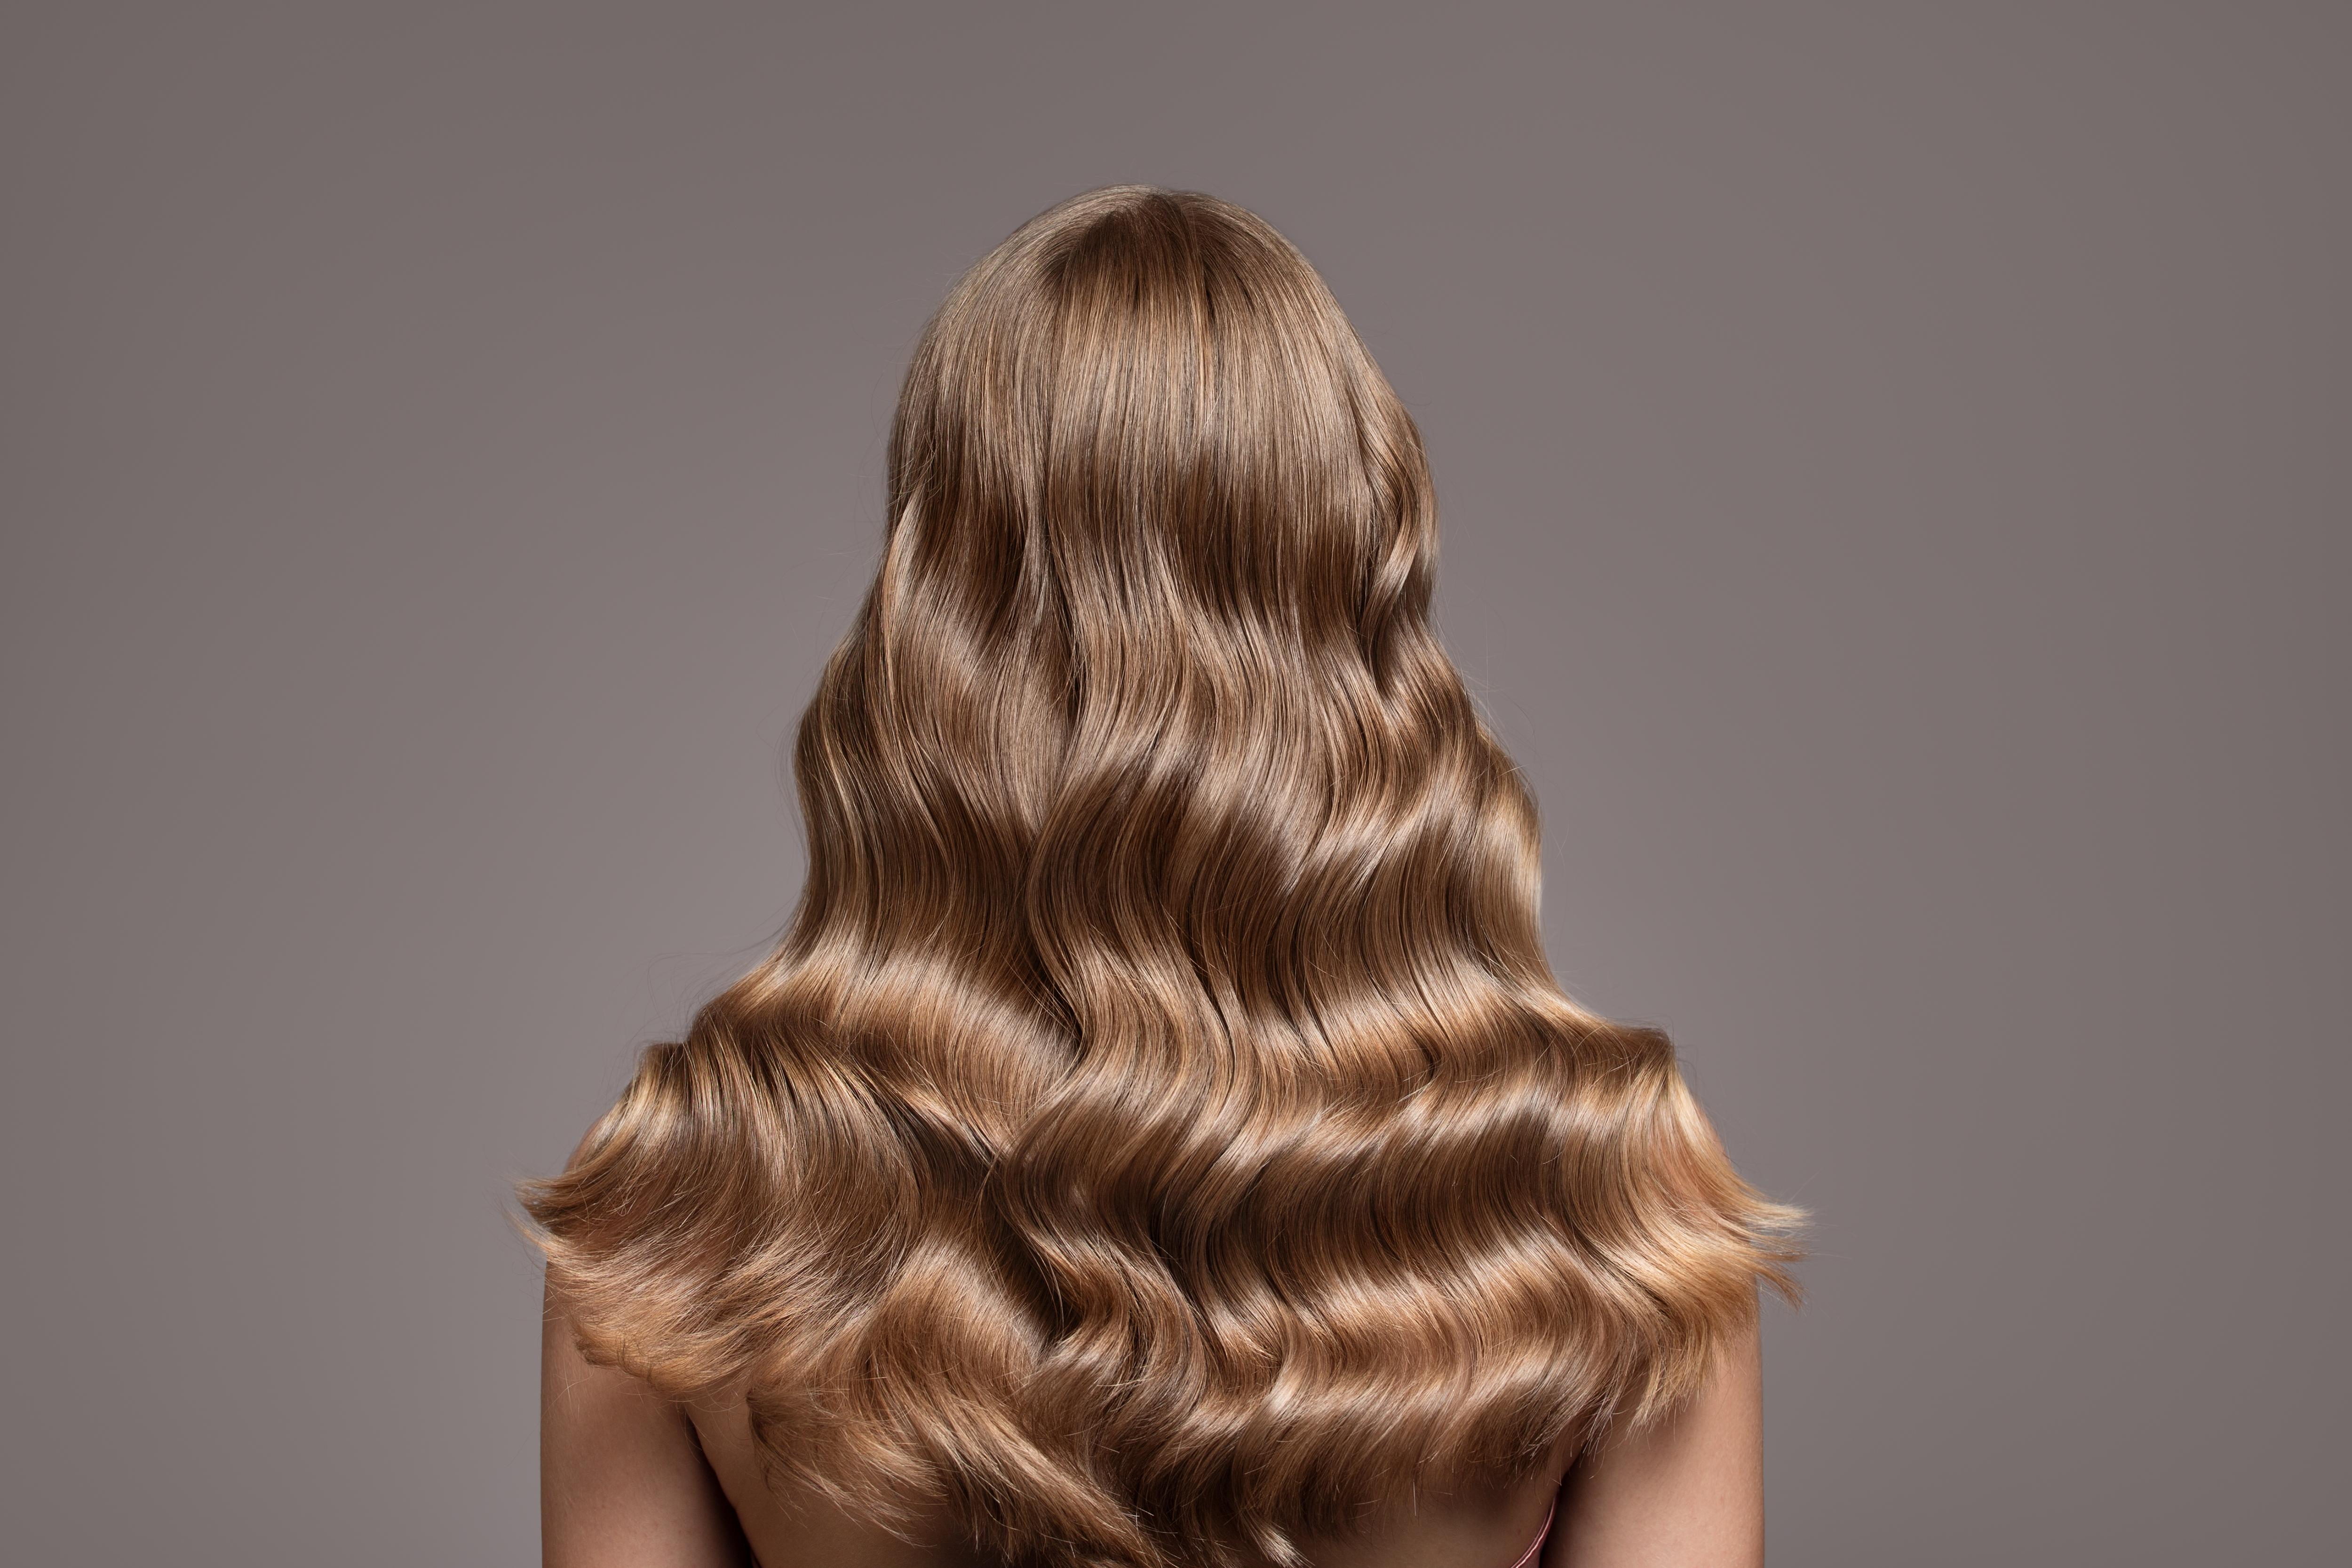 قصات شعر طويل